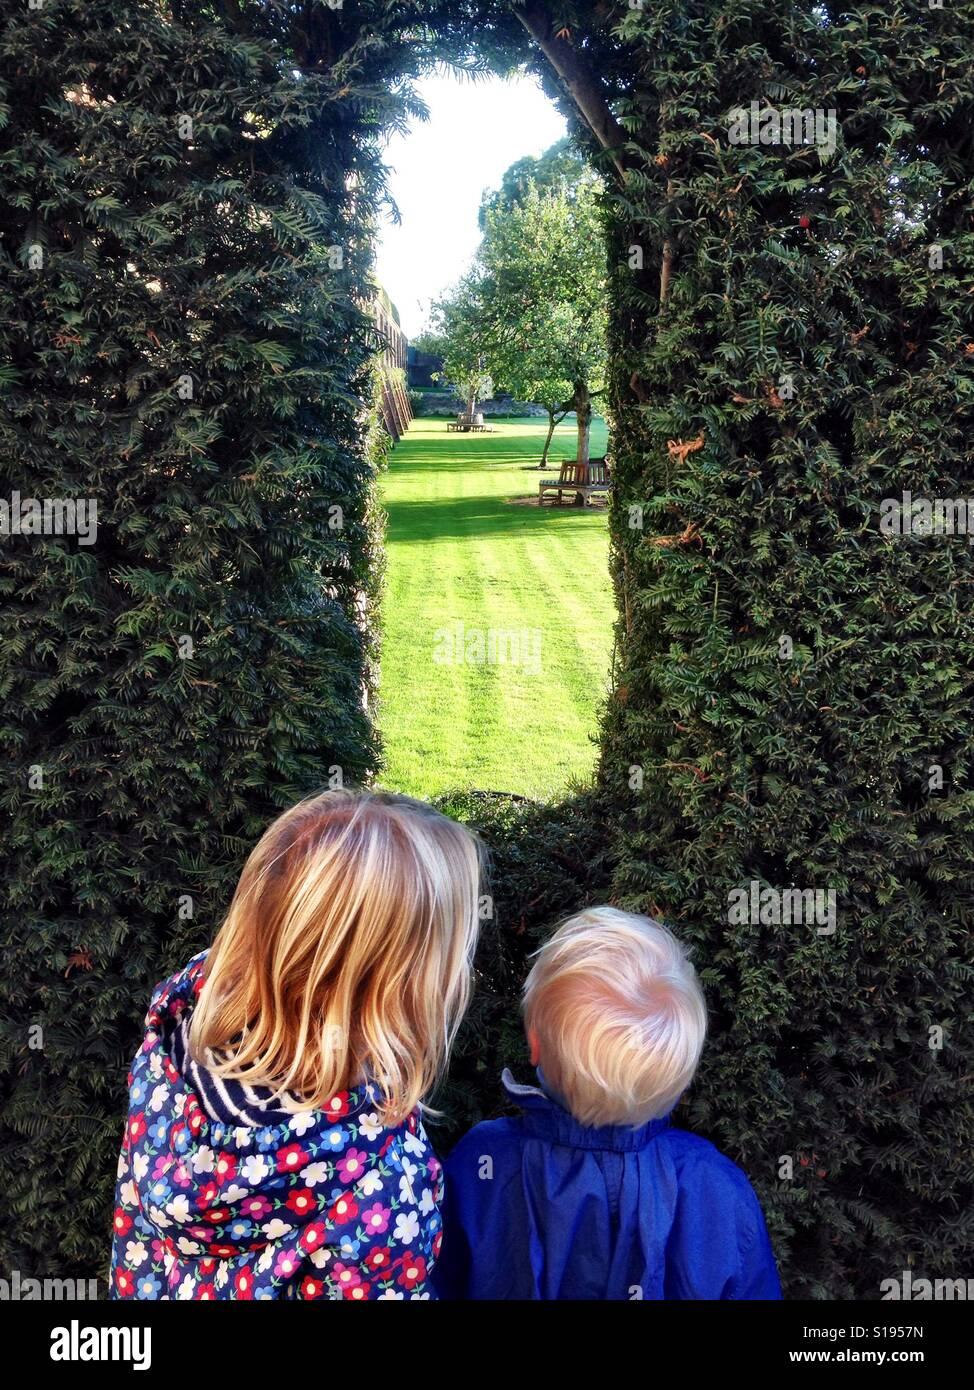 Peeking through the hedge - Stock Image